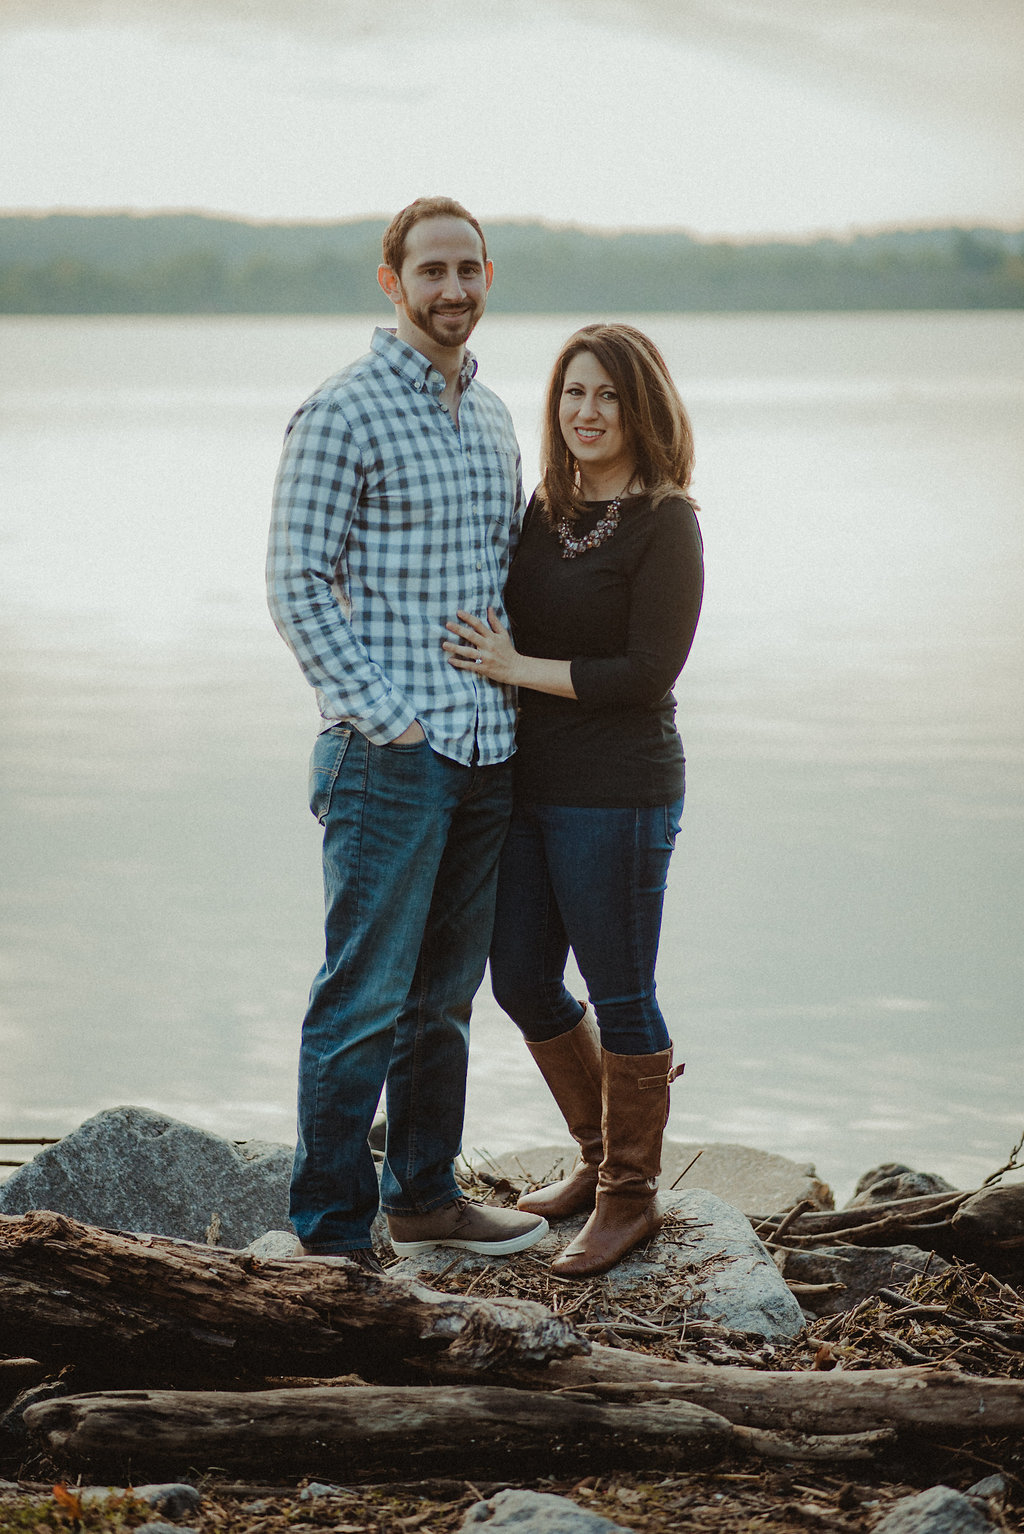 Couple posing on rock near river